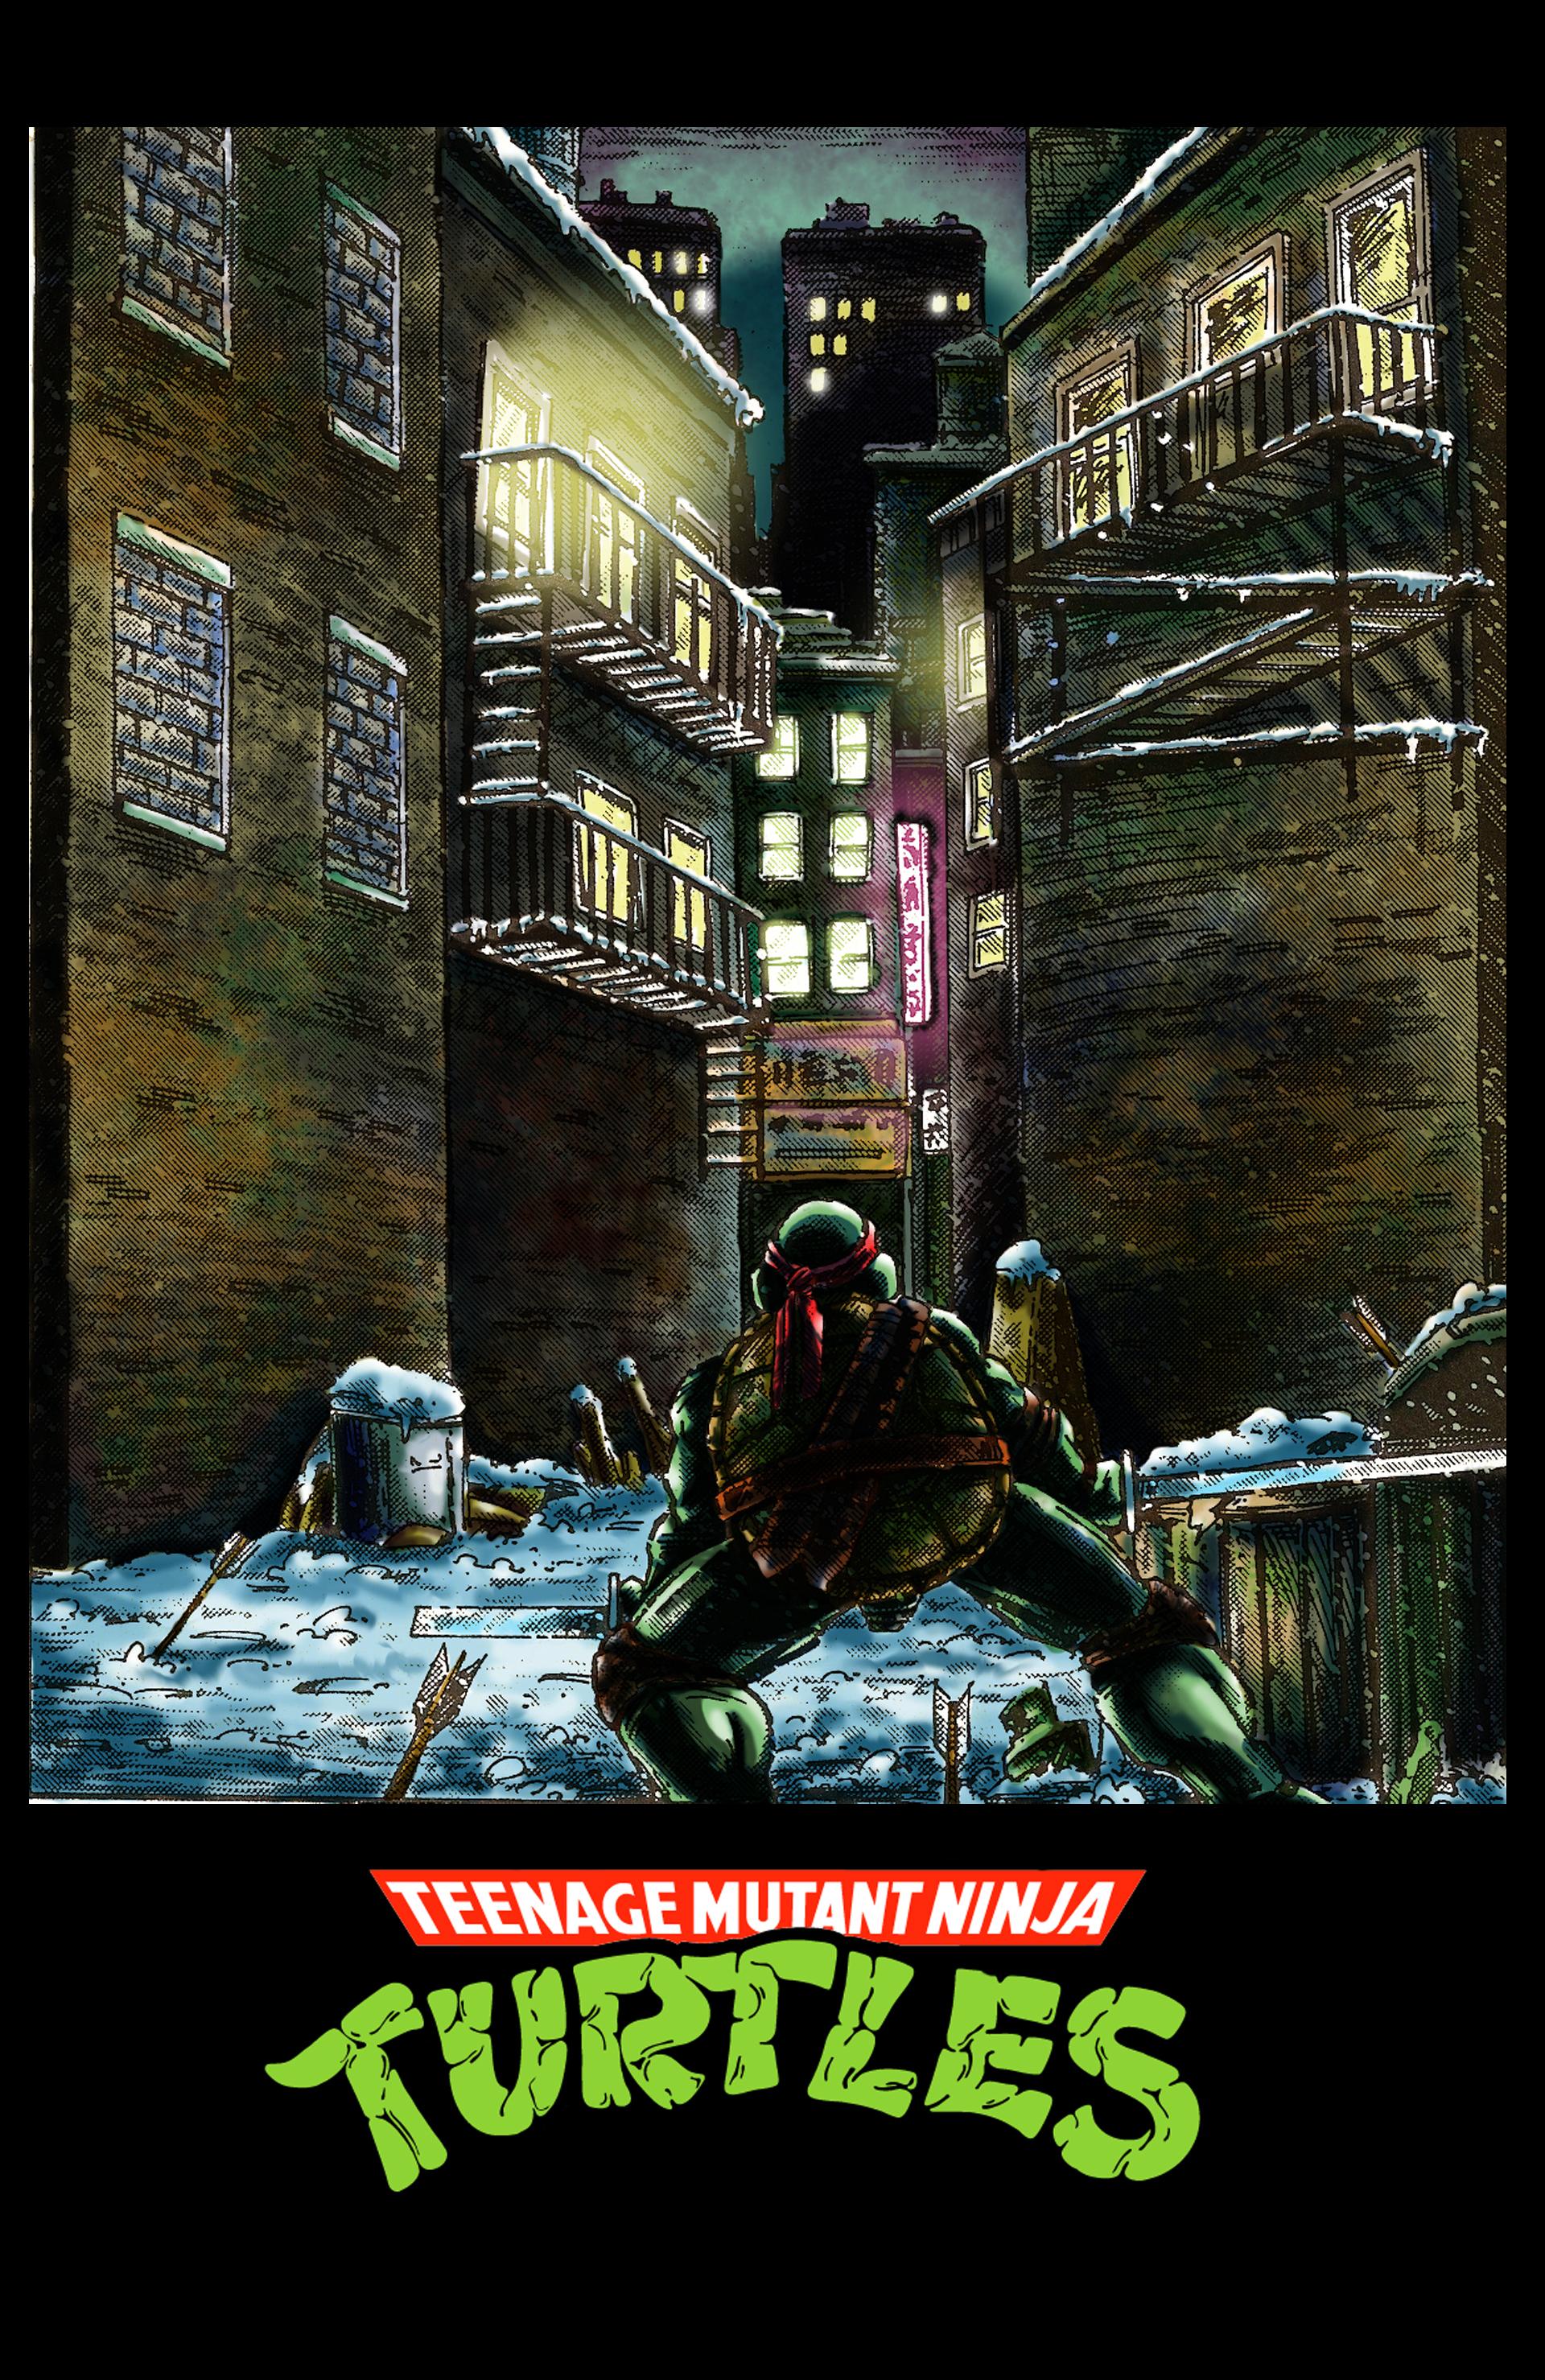 Ninja Turtles Relaunch Poster by Crockard on DeviantArt